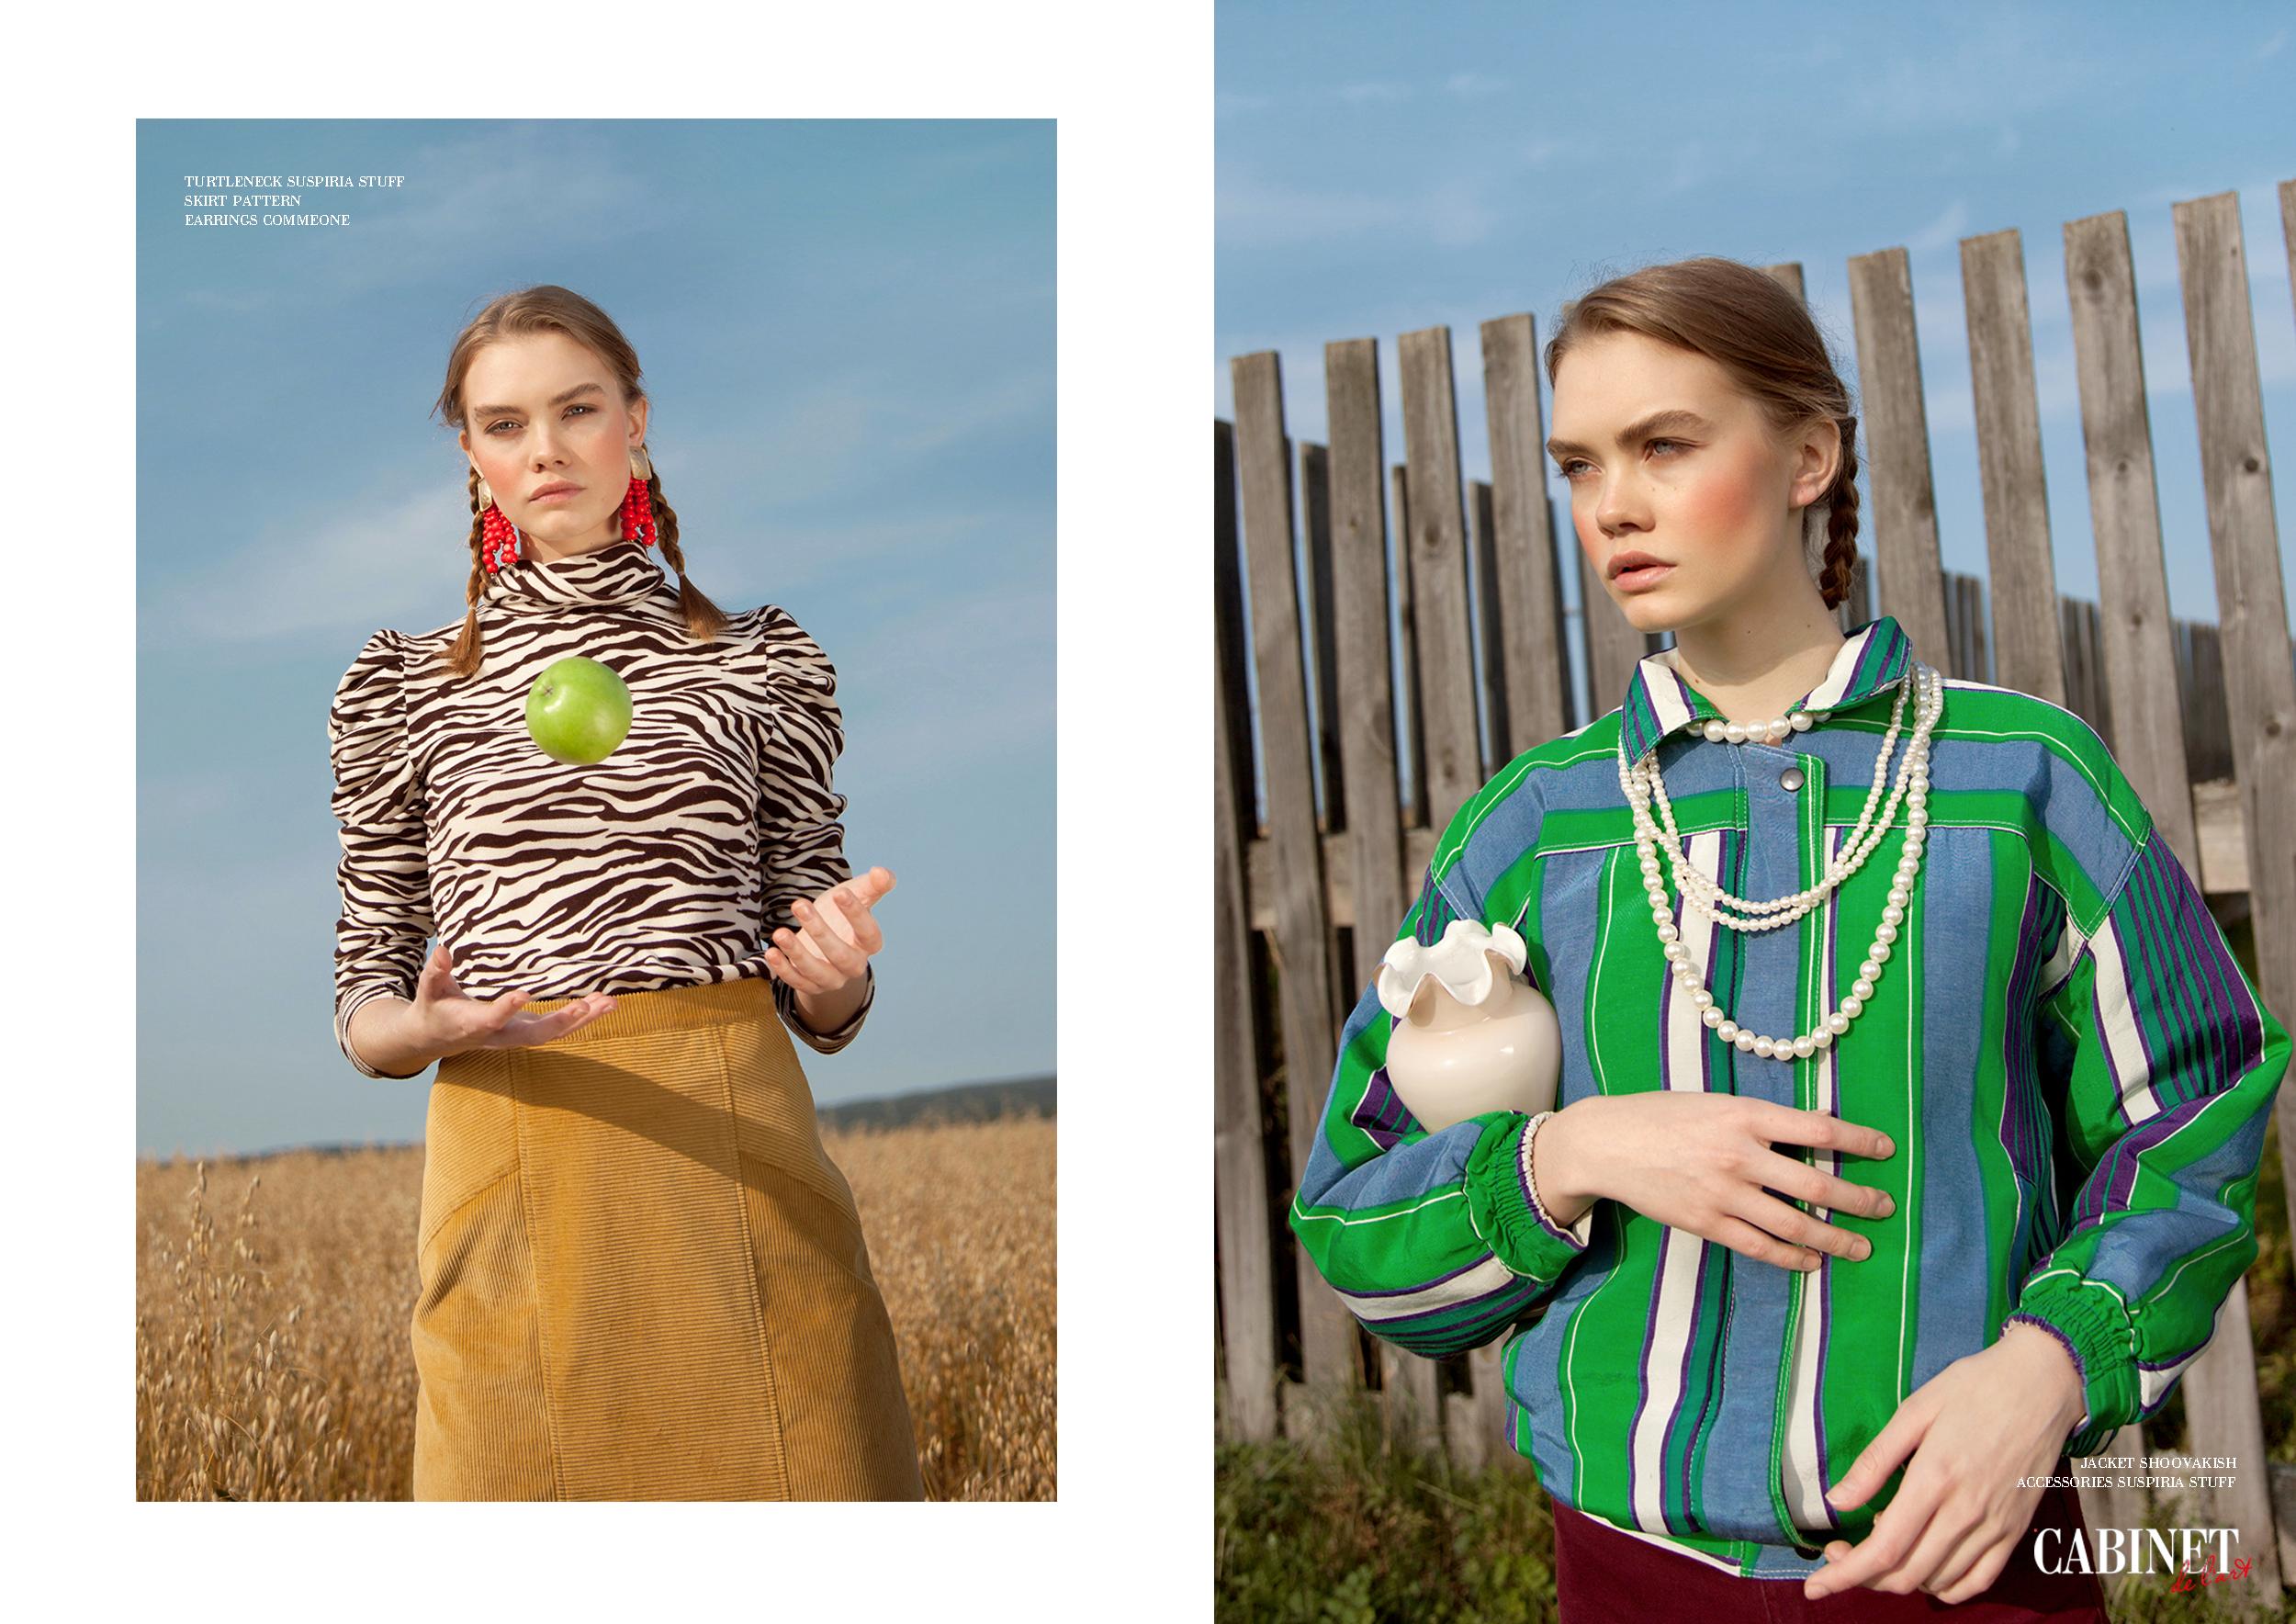 Справа: Turtleneck Suspiria Stuff Skirt Pattern, Earrings CommeOne ; Слева:Jacket Shoovakish, Accessories Suspiria Stuff